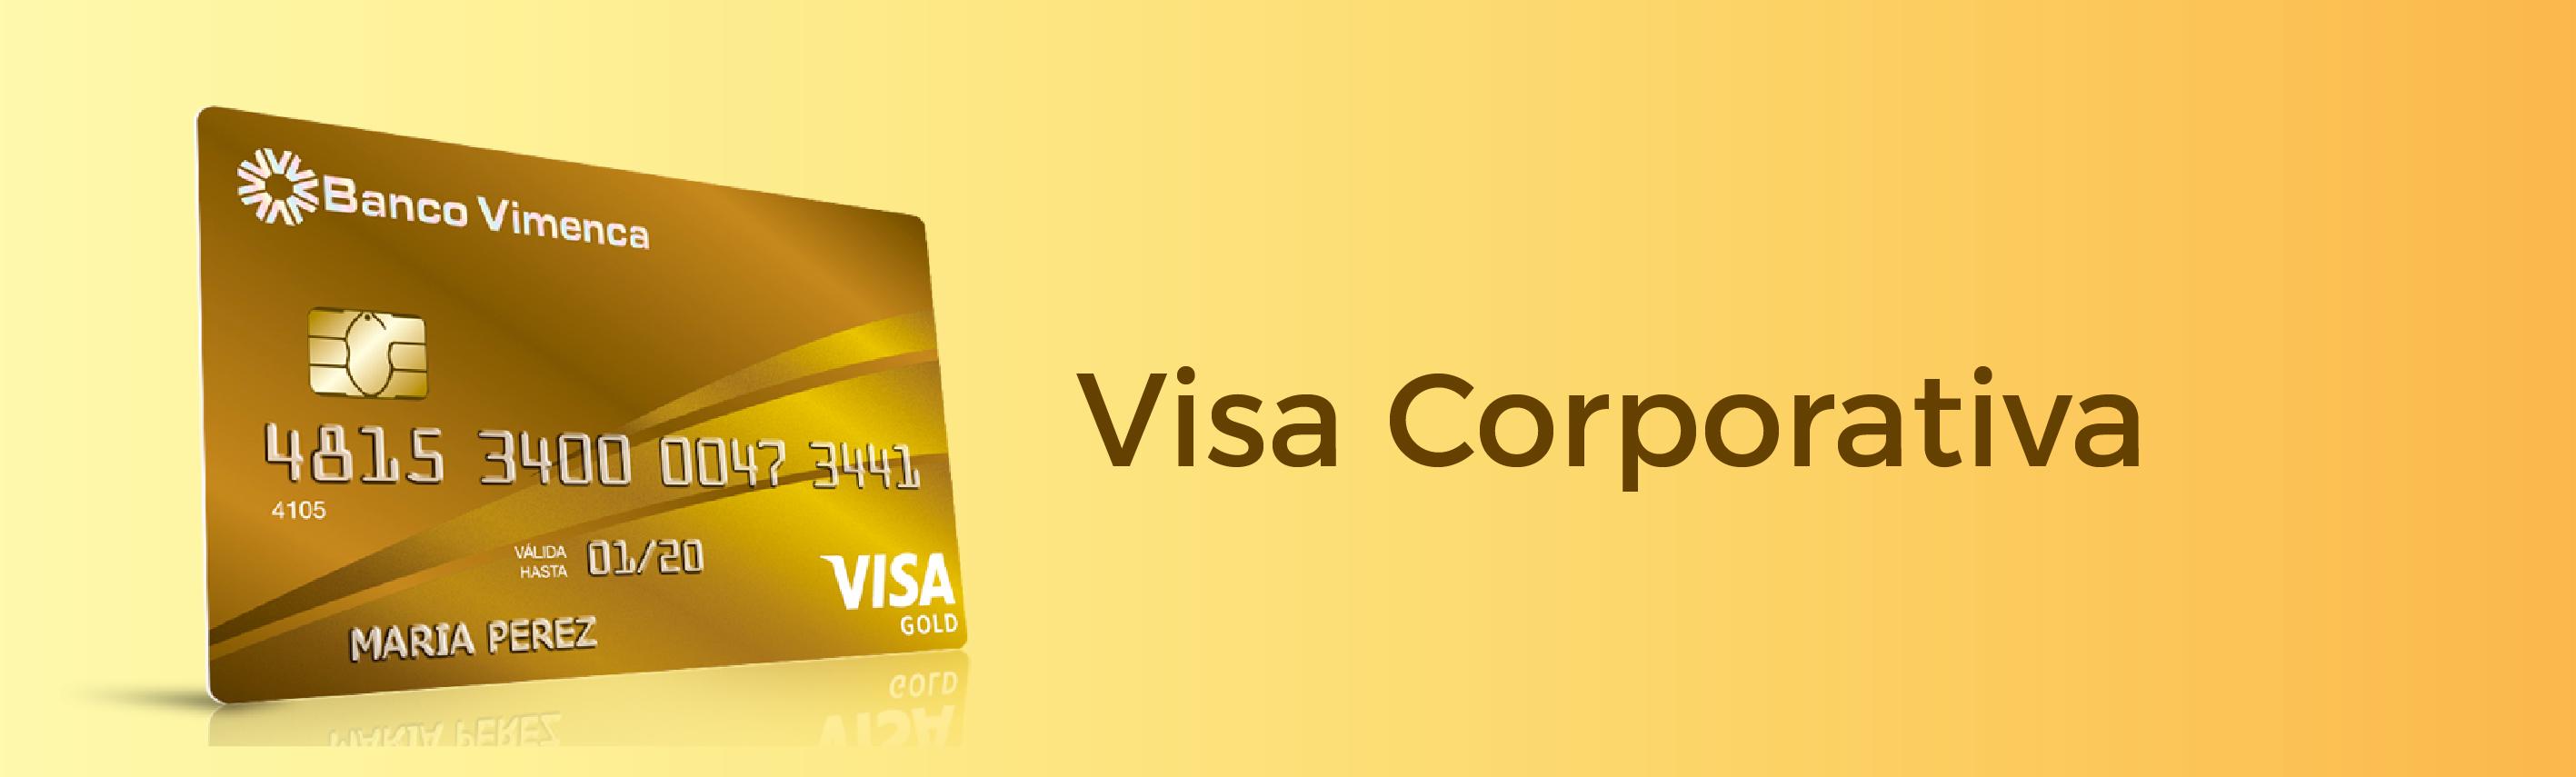 Tarjeta de Crédito Visa Corporativa